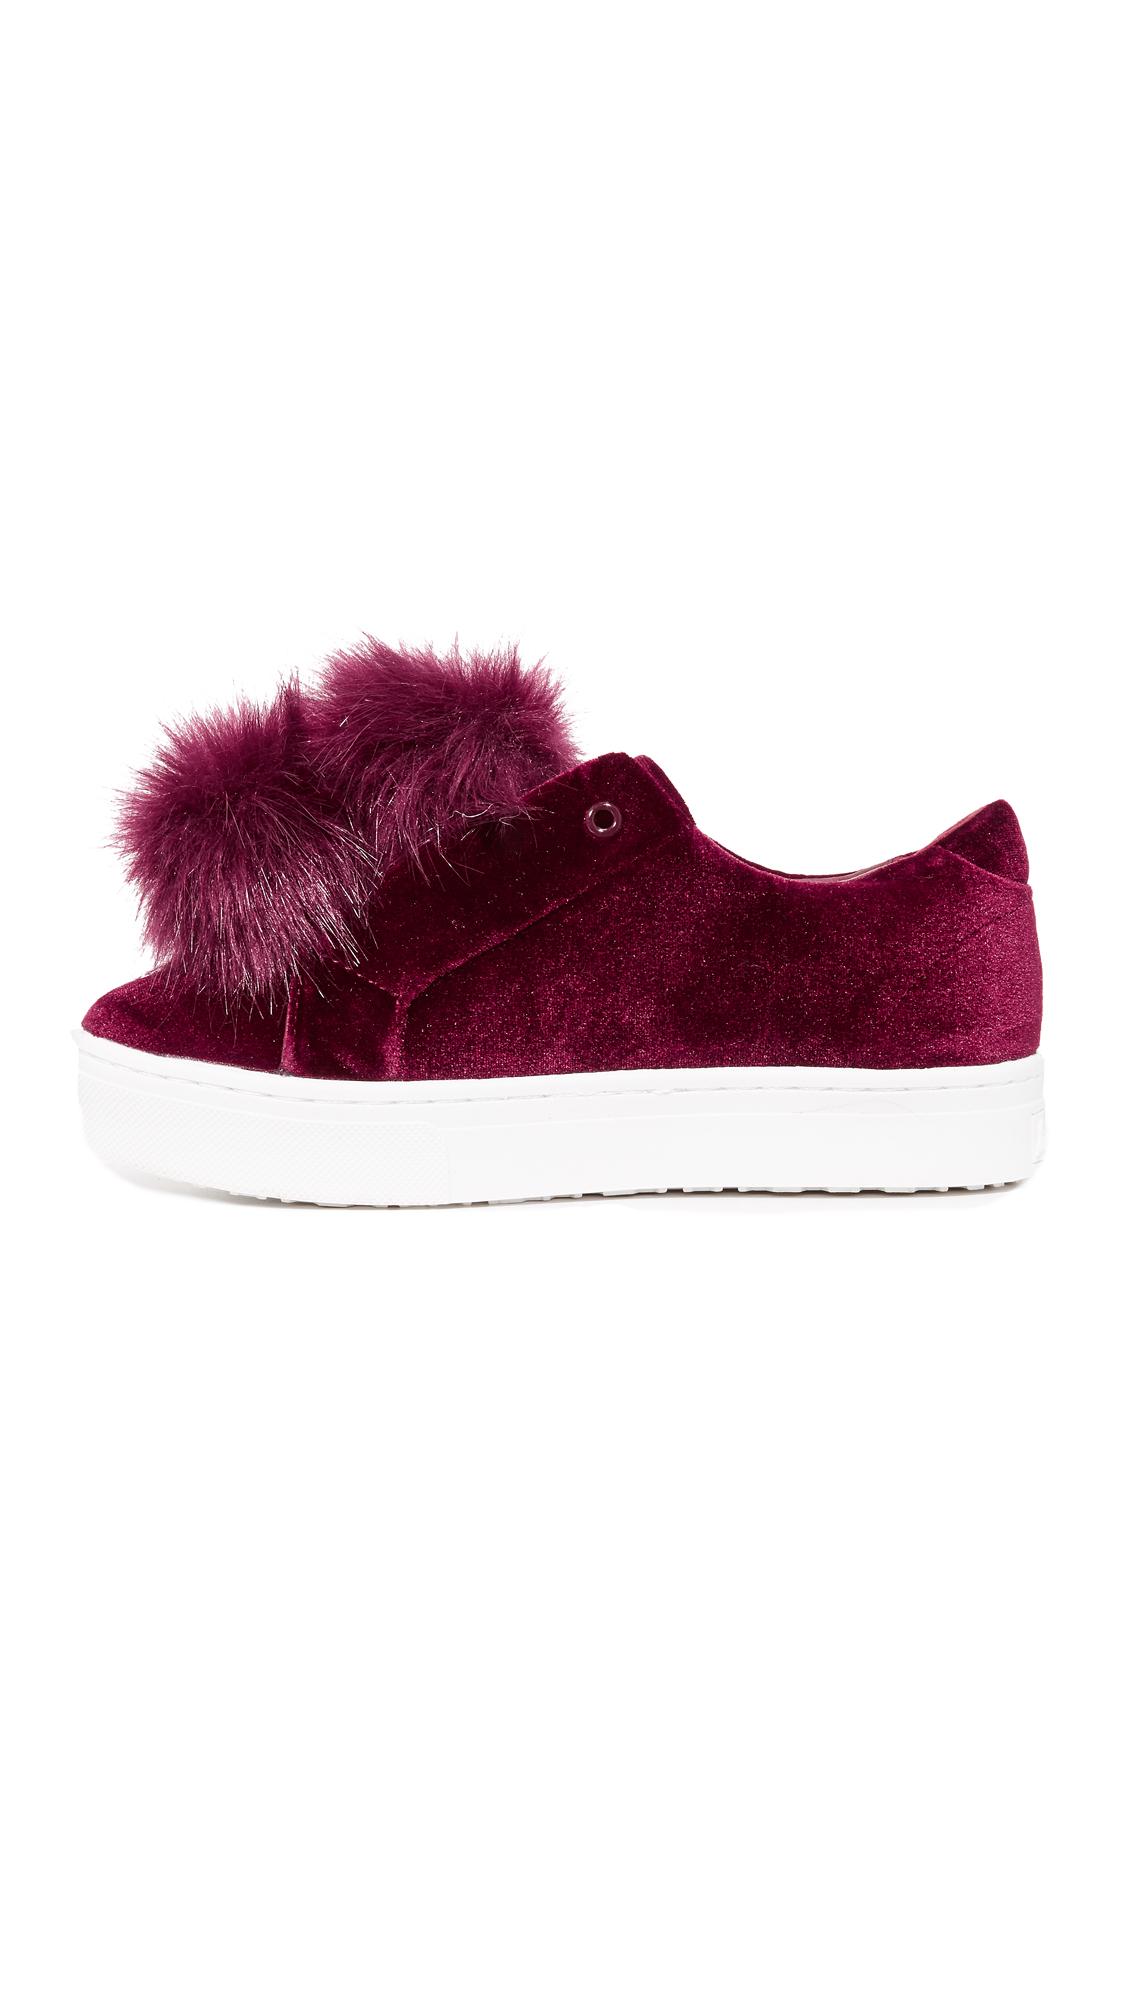 98c67f7af586 Sam Edelman Leya Velvet Pom Pom Sneakers